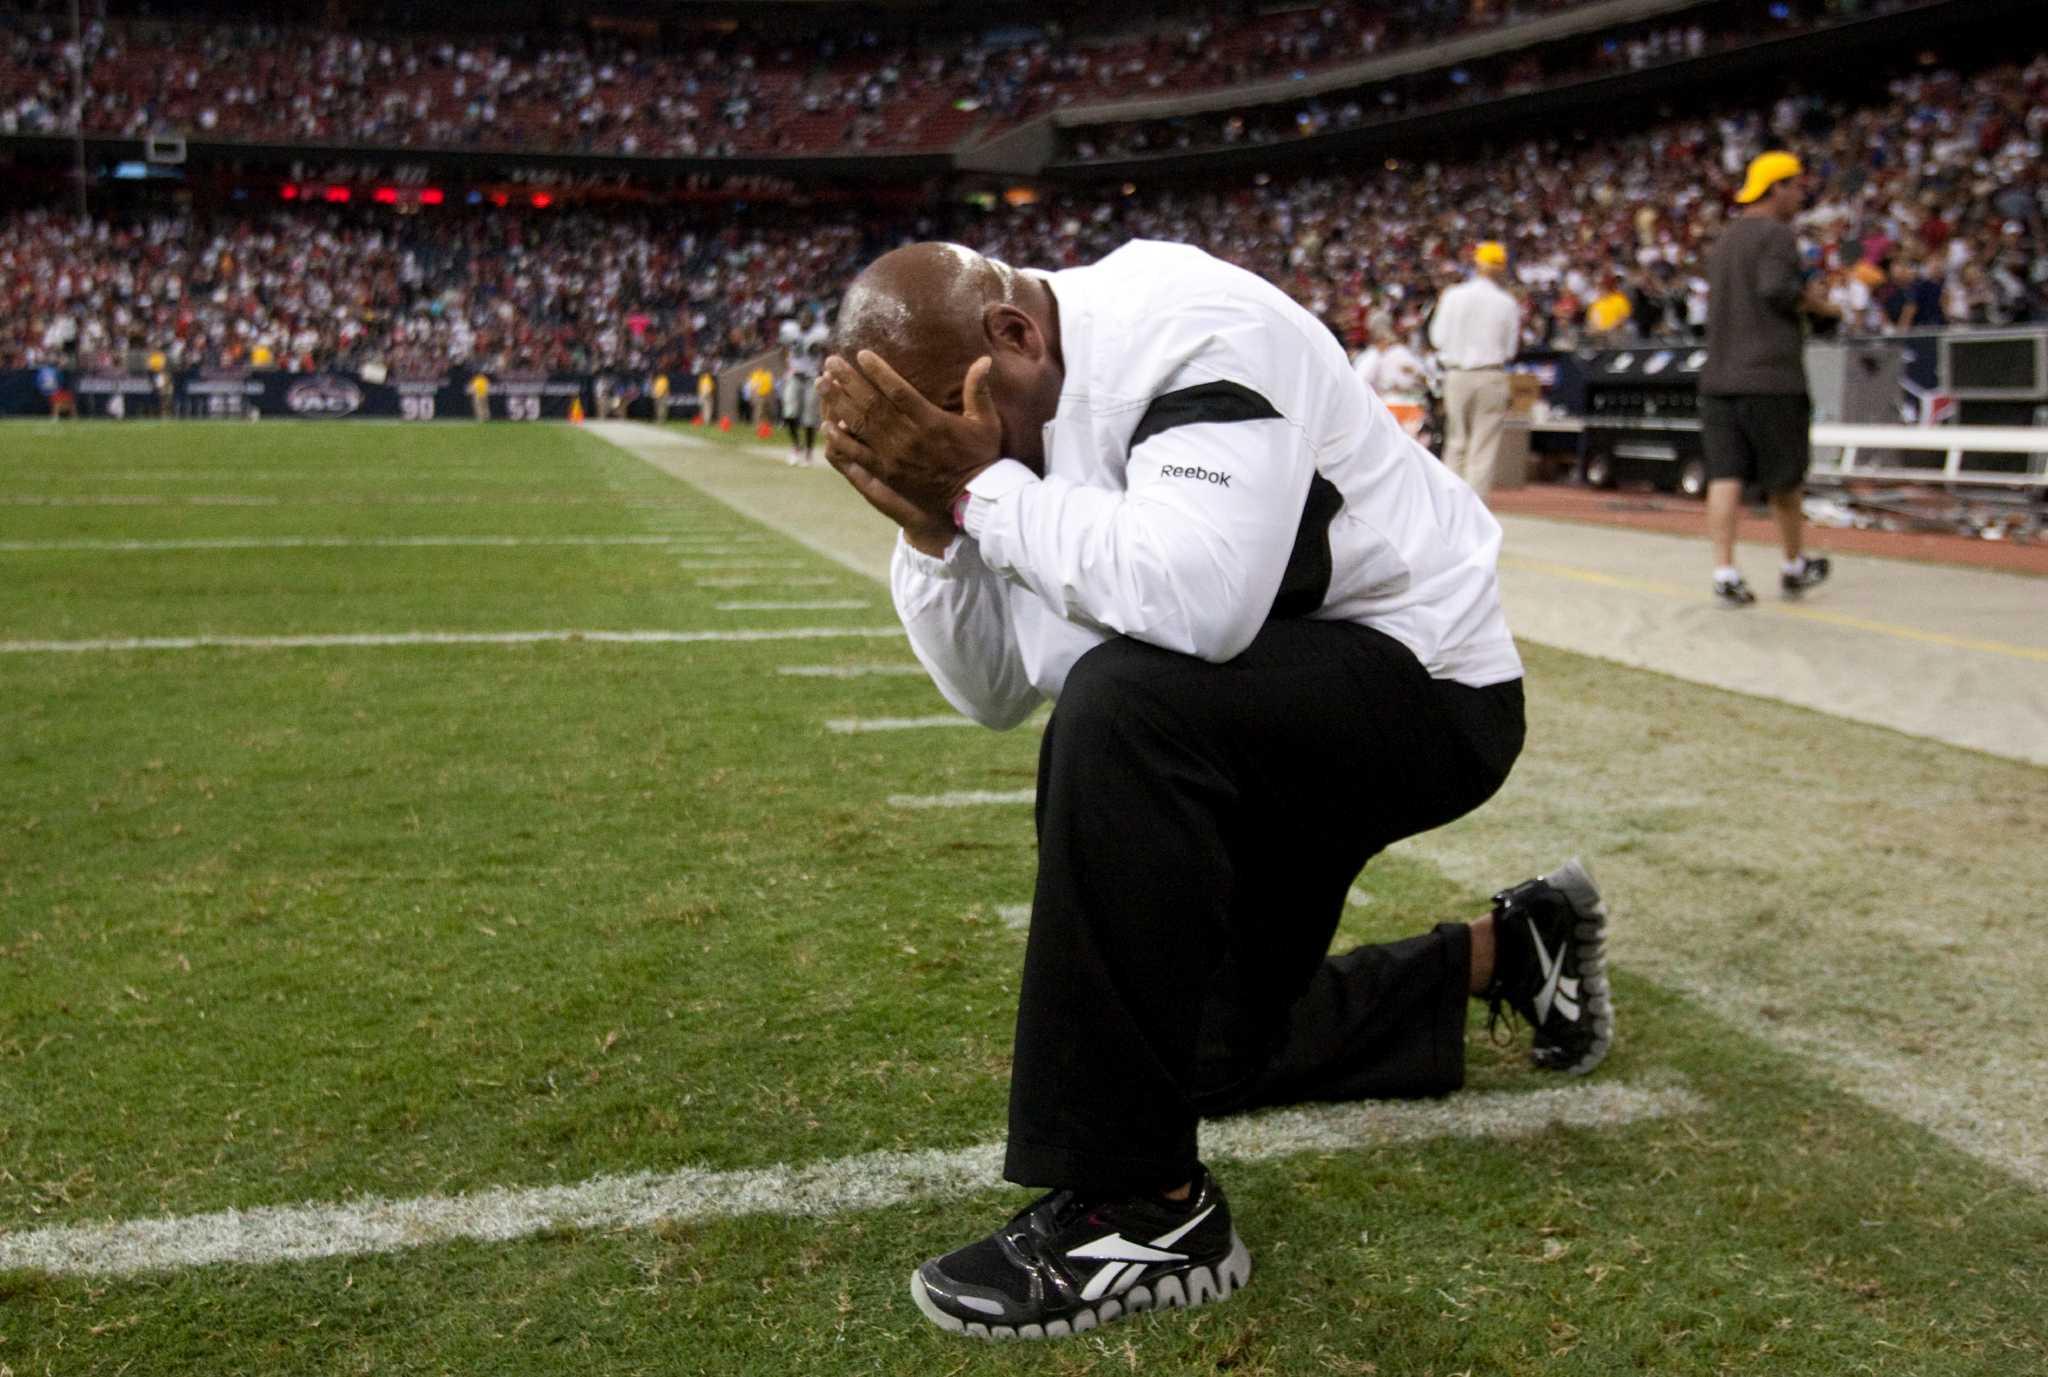 Raiders Had Emotional Win In Houston After Al Davis Death